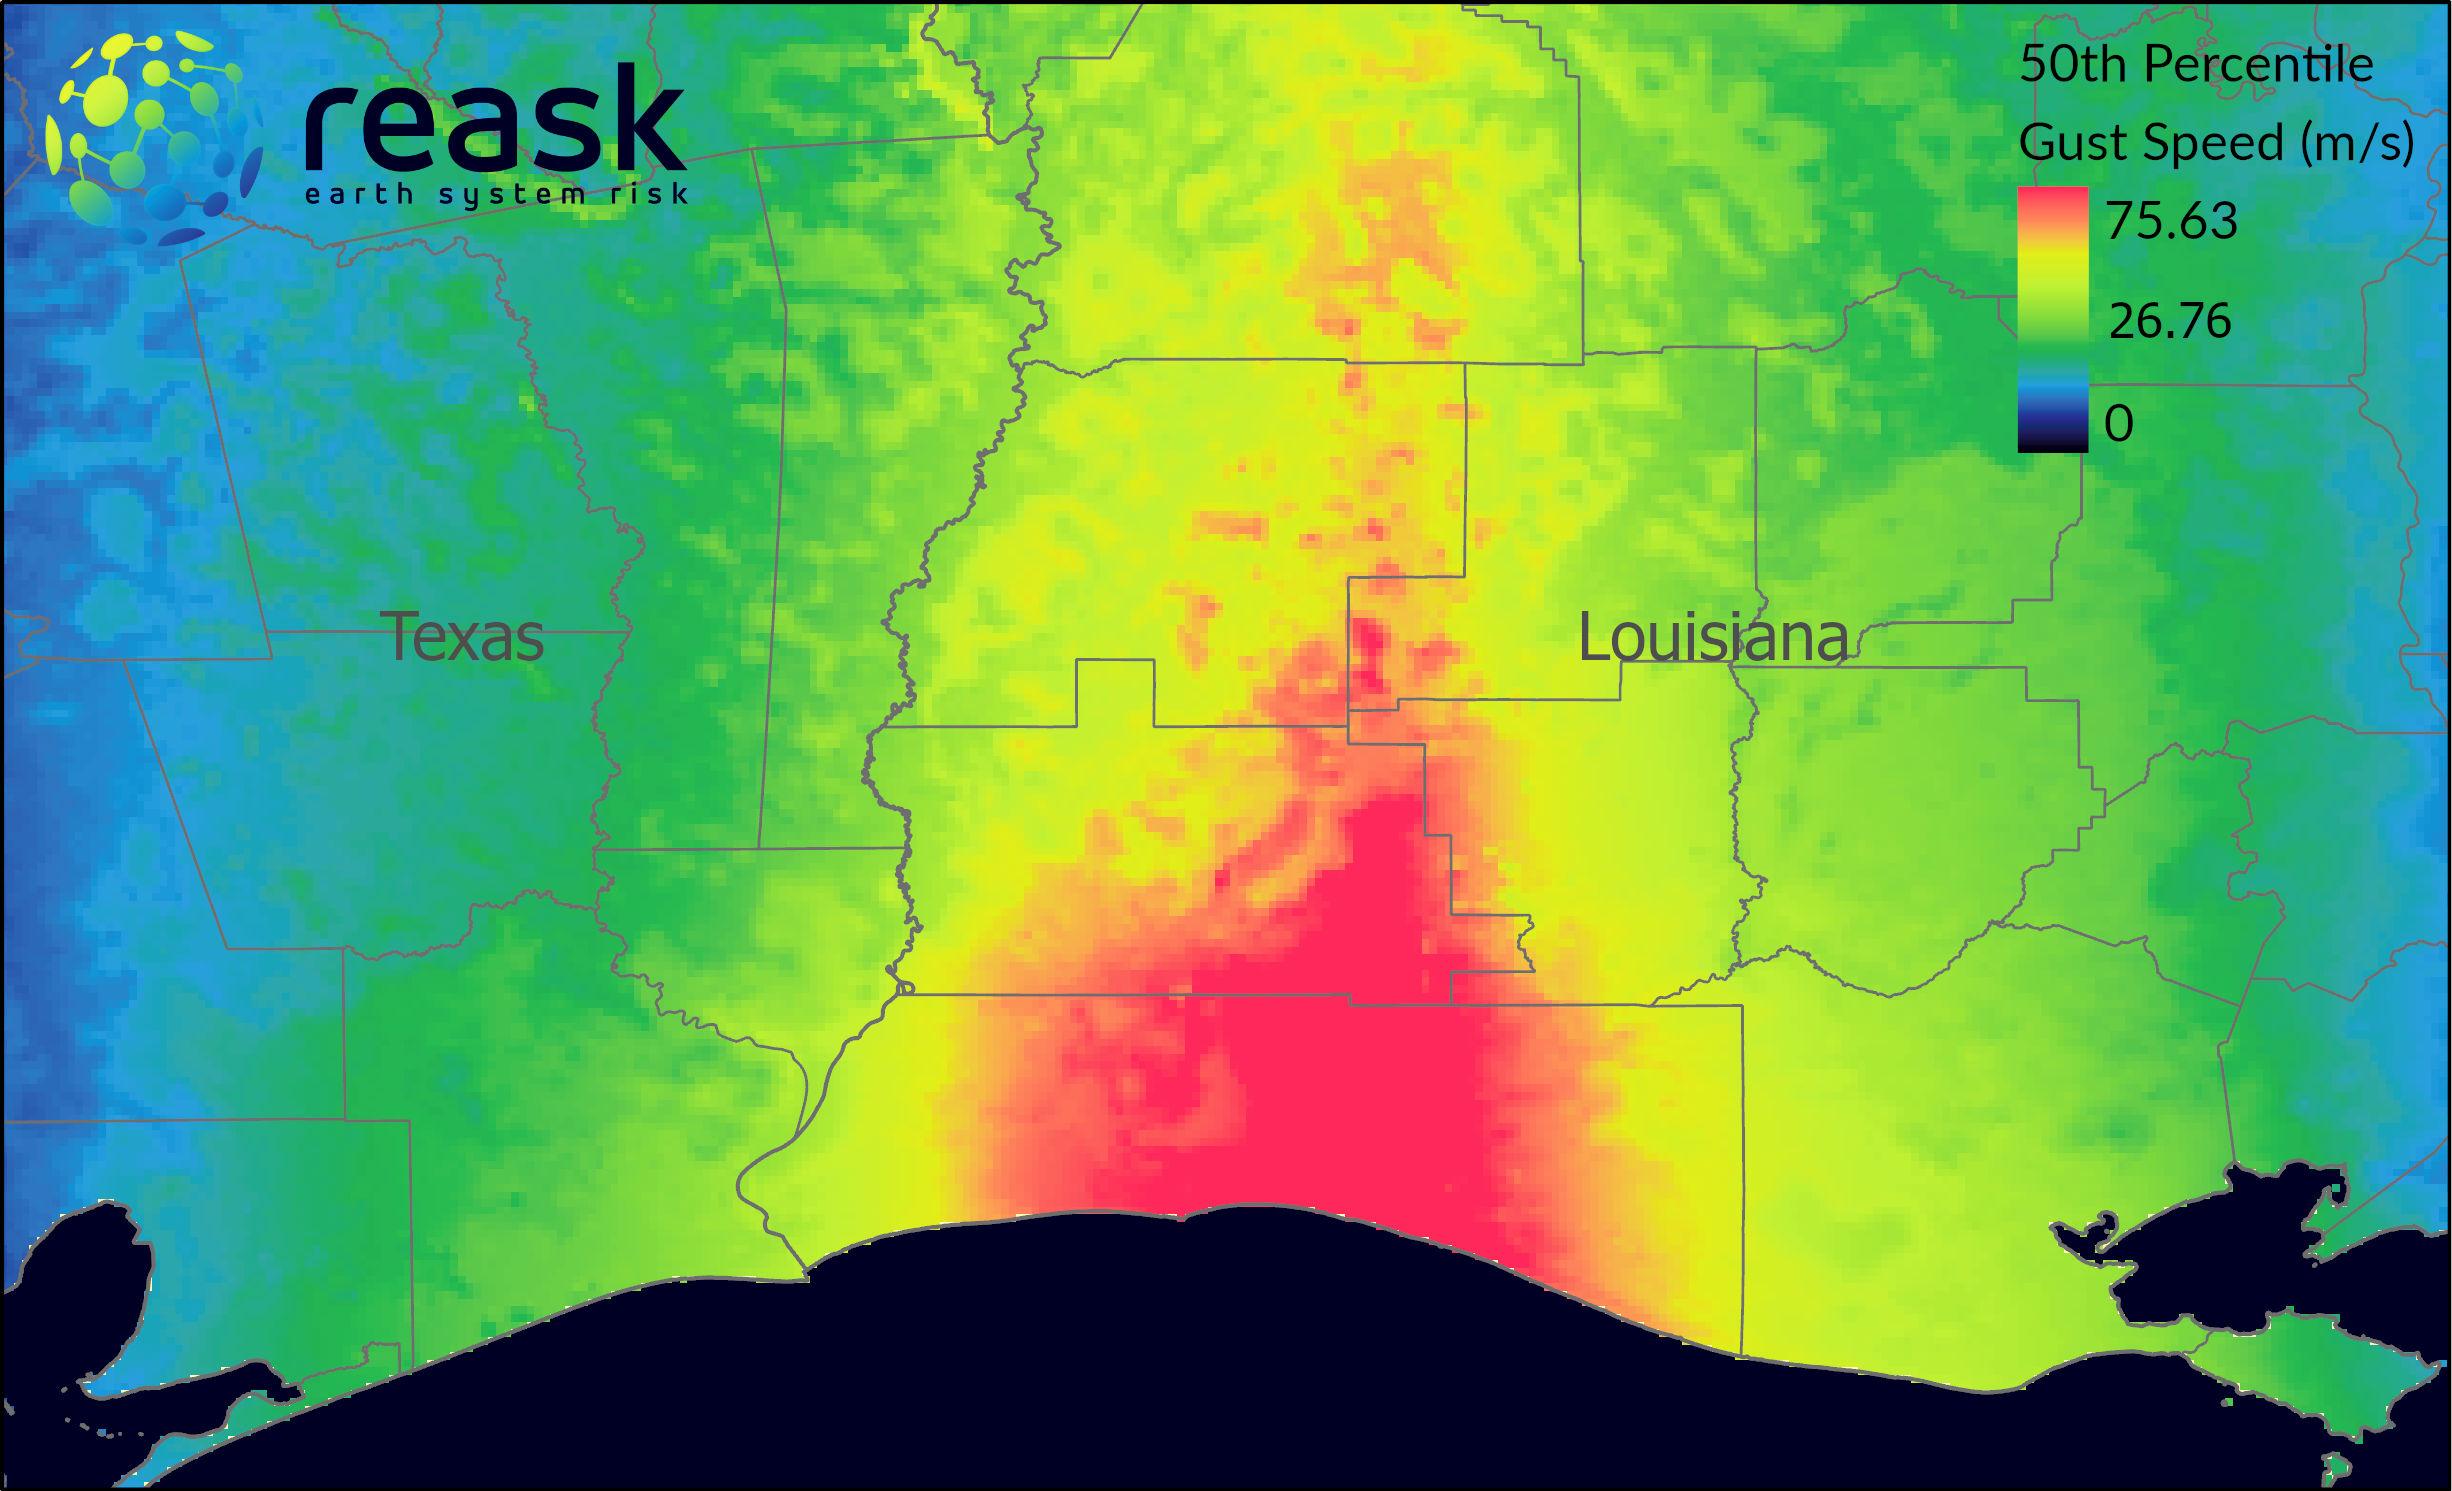 HindCyc: Immediate Post-Landfall Probabilistic Gust Estimates